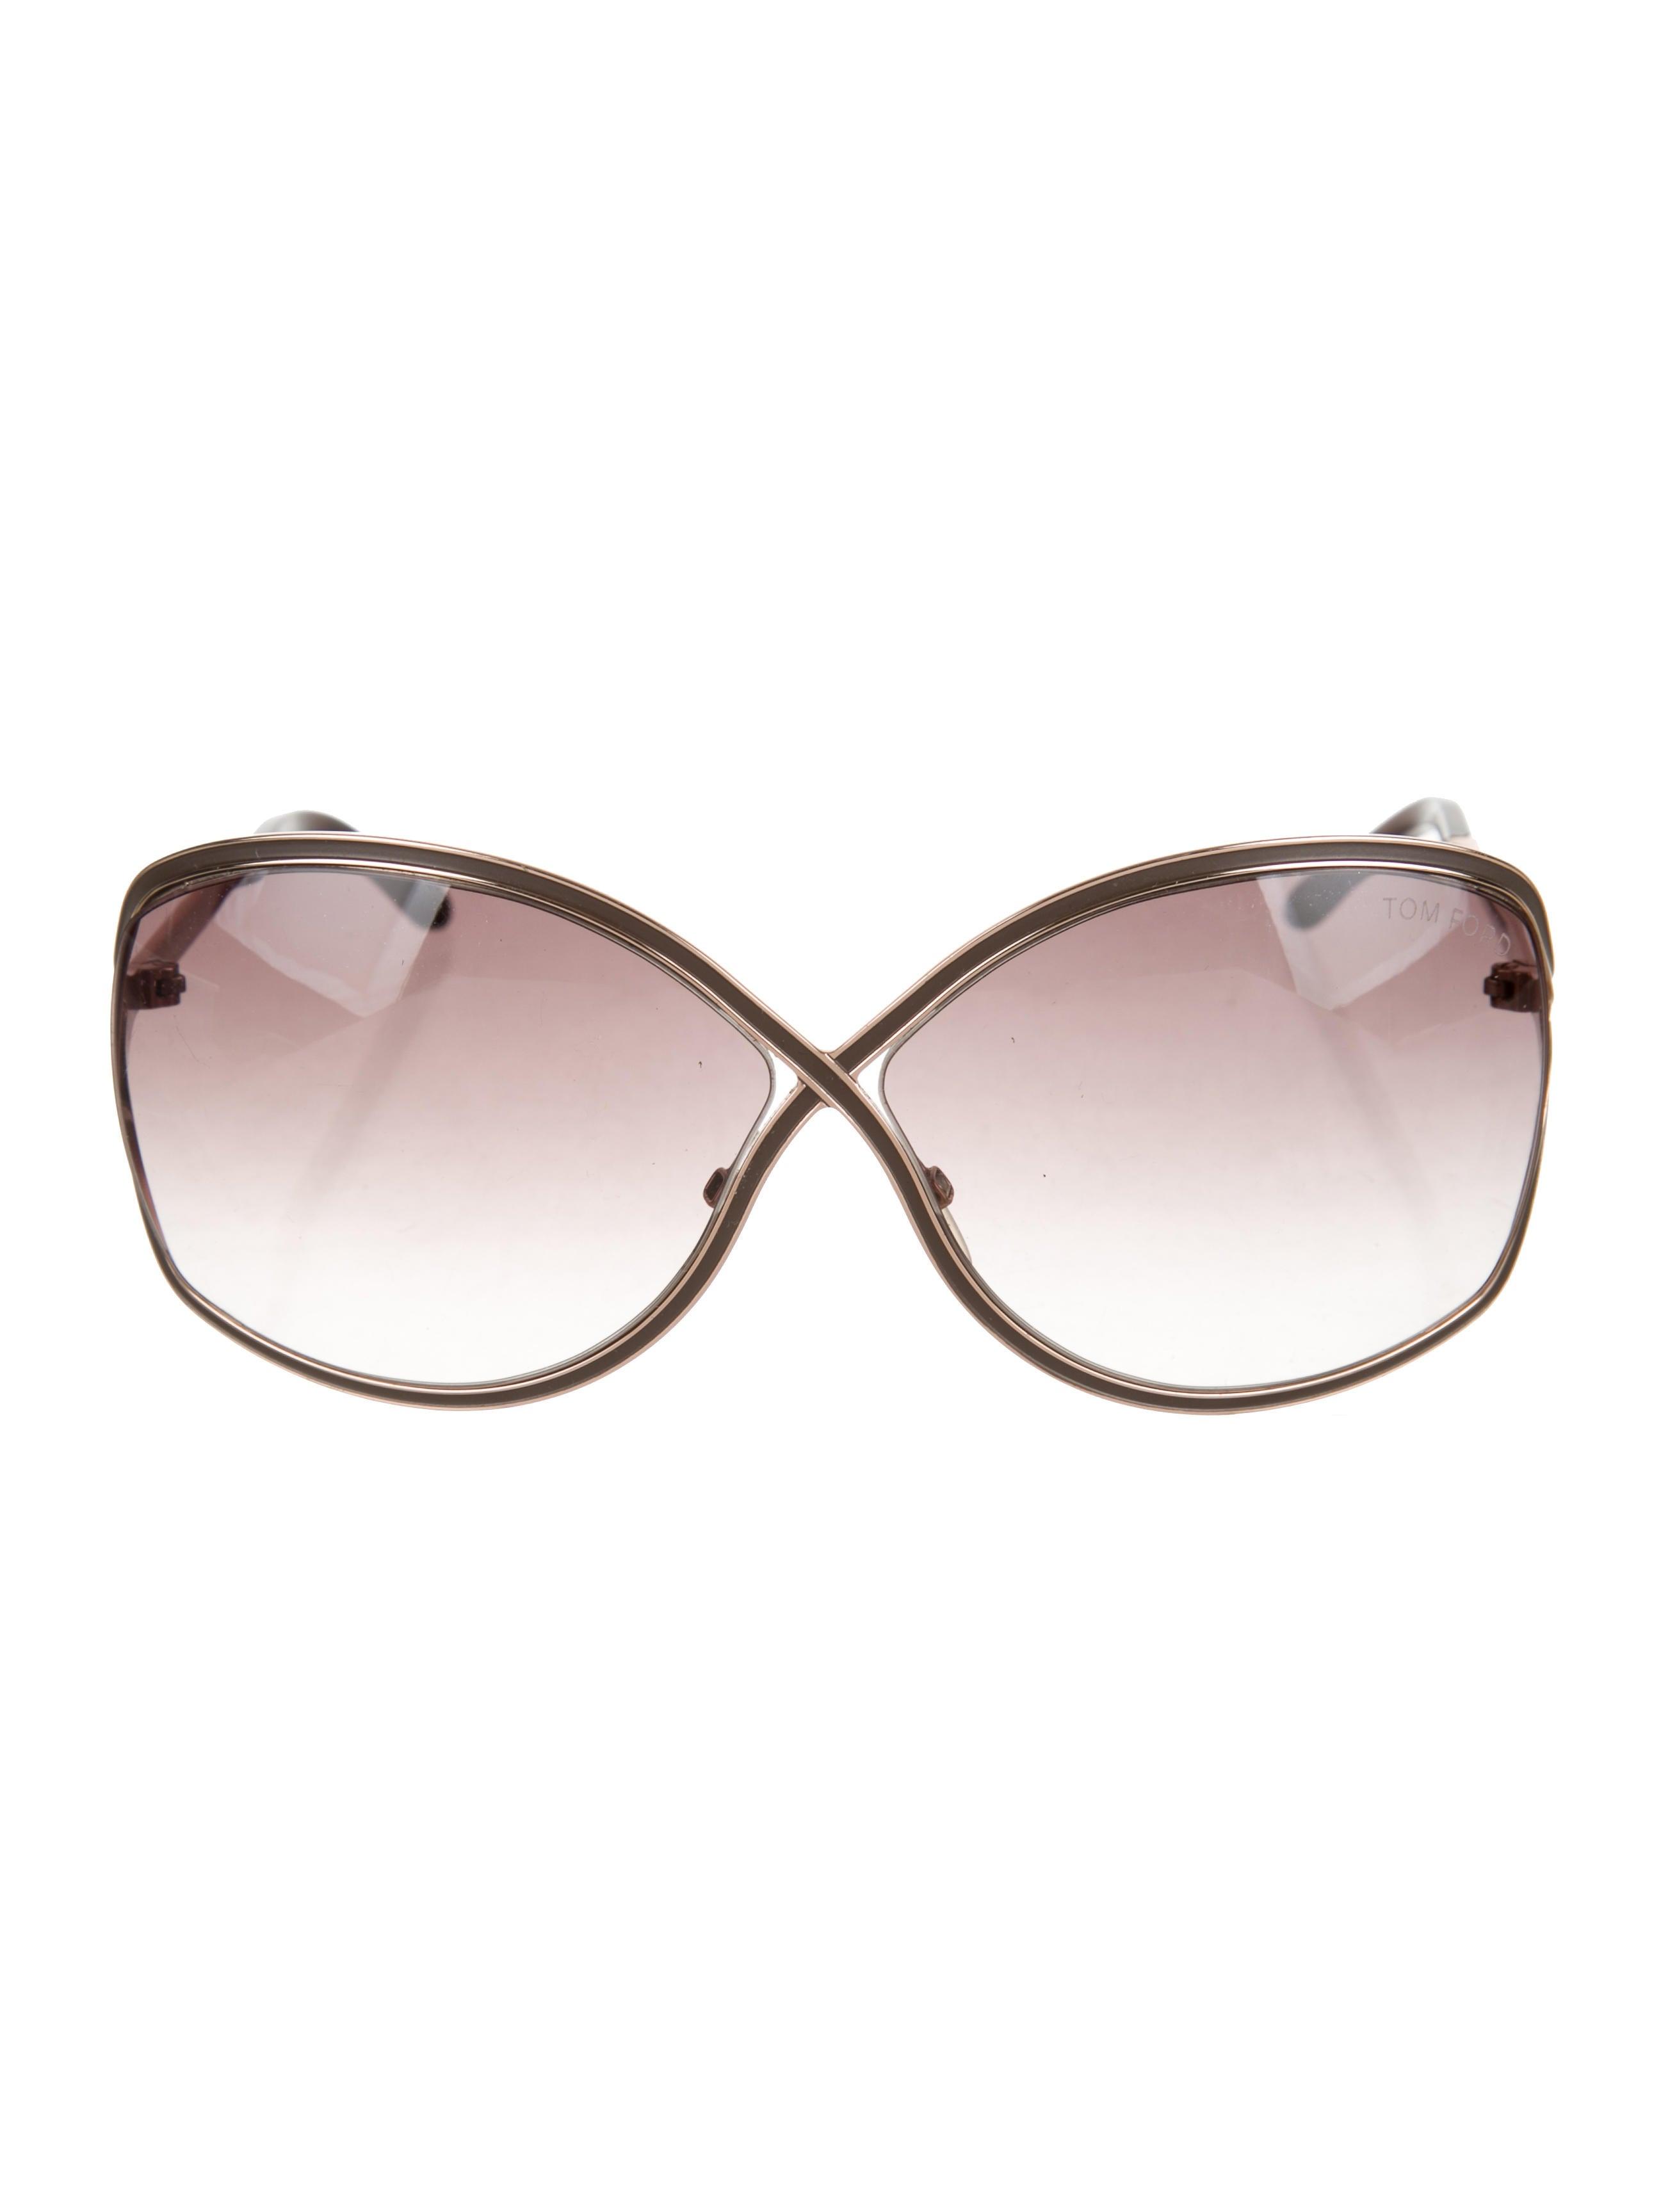 c90ad85b086c2 Tom Ford Rickie Oversize Sunglasses - Accessories - TOM49409